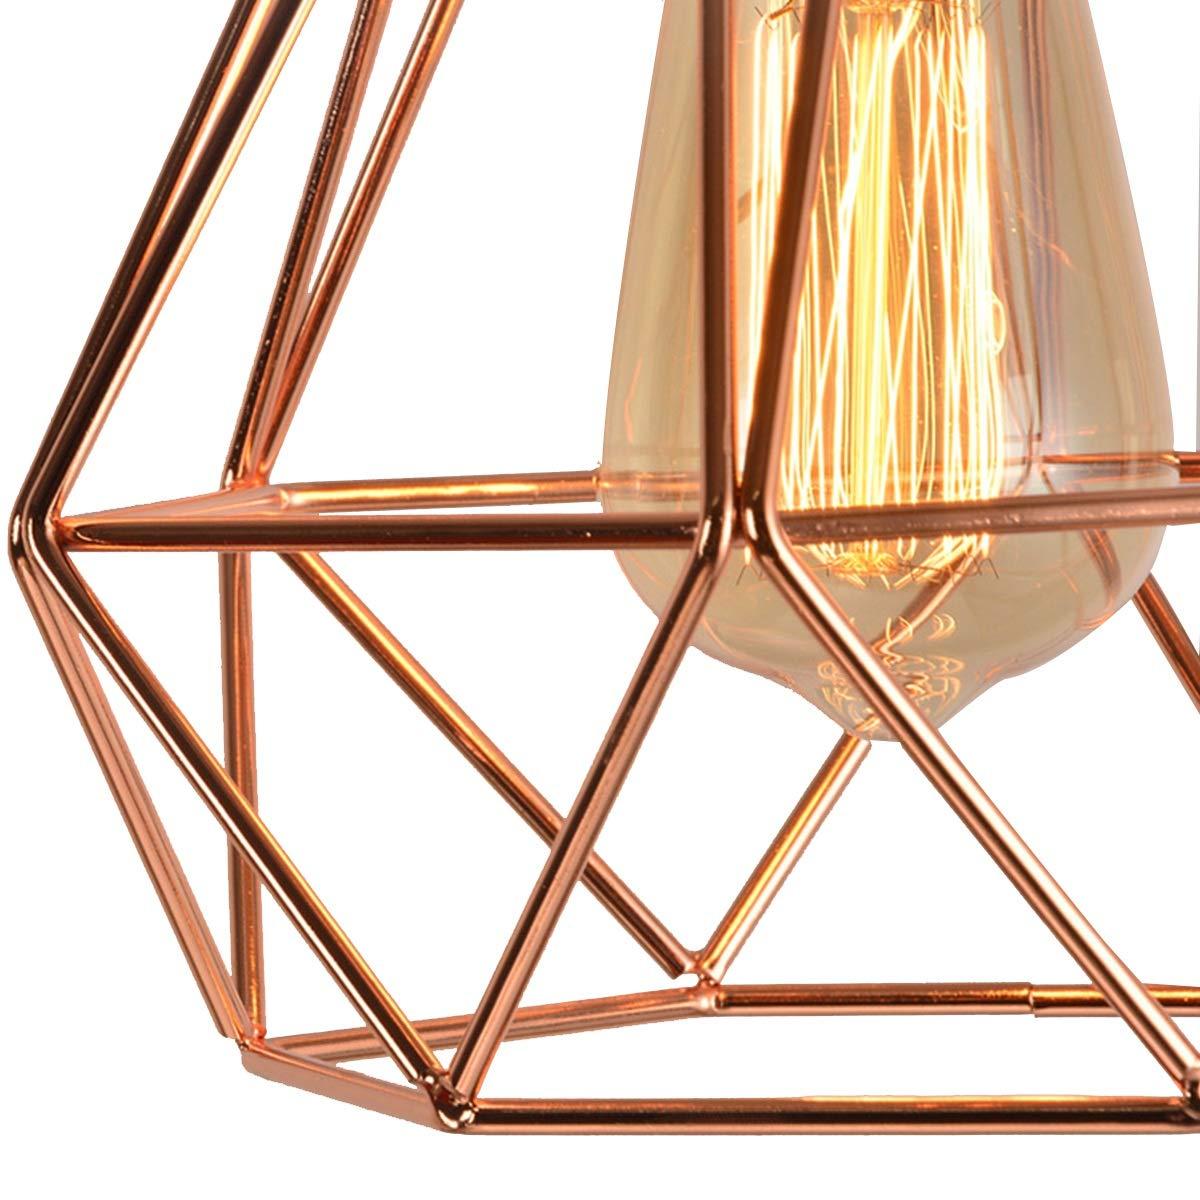 NANGE Modern Chandelier,Personality Plating Rose Gold Pendant Lights,Kitchen Island Table Dining Room Bedroom Entryway Hanging Lamp,E27(Without Light Source) (Color : AC 110V, Size : Gold) by NANGE (Image #5)